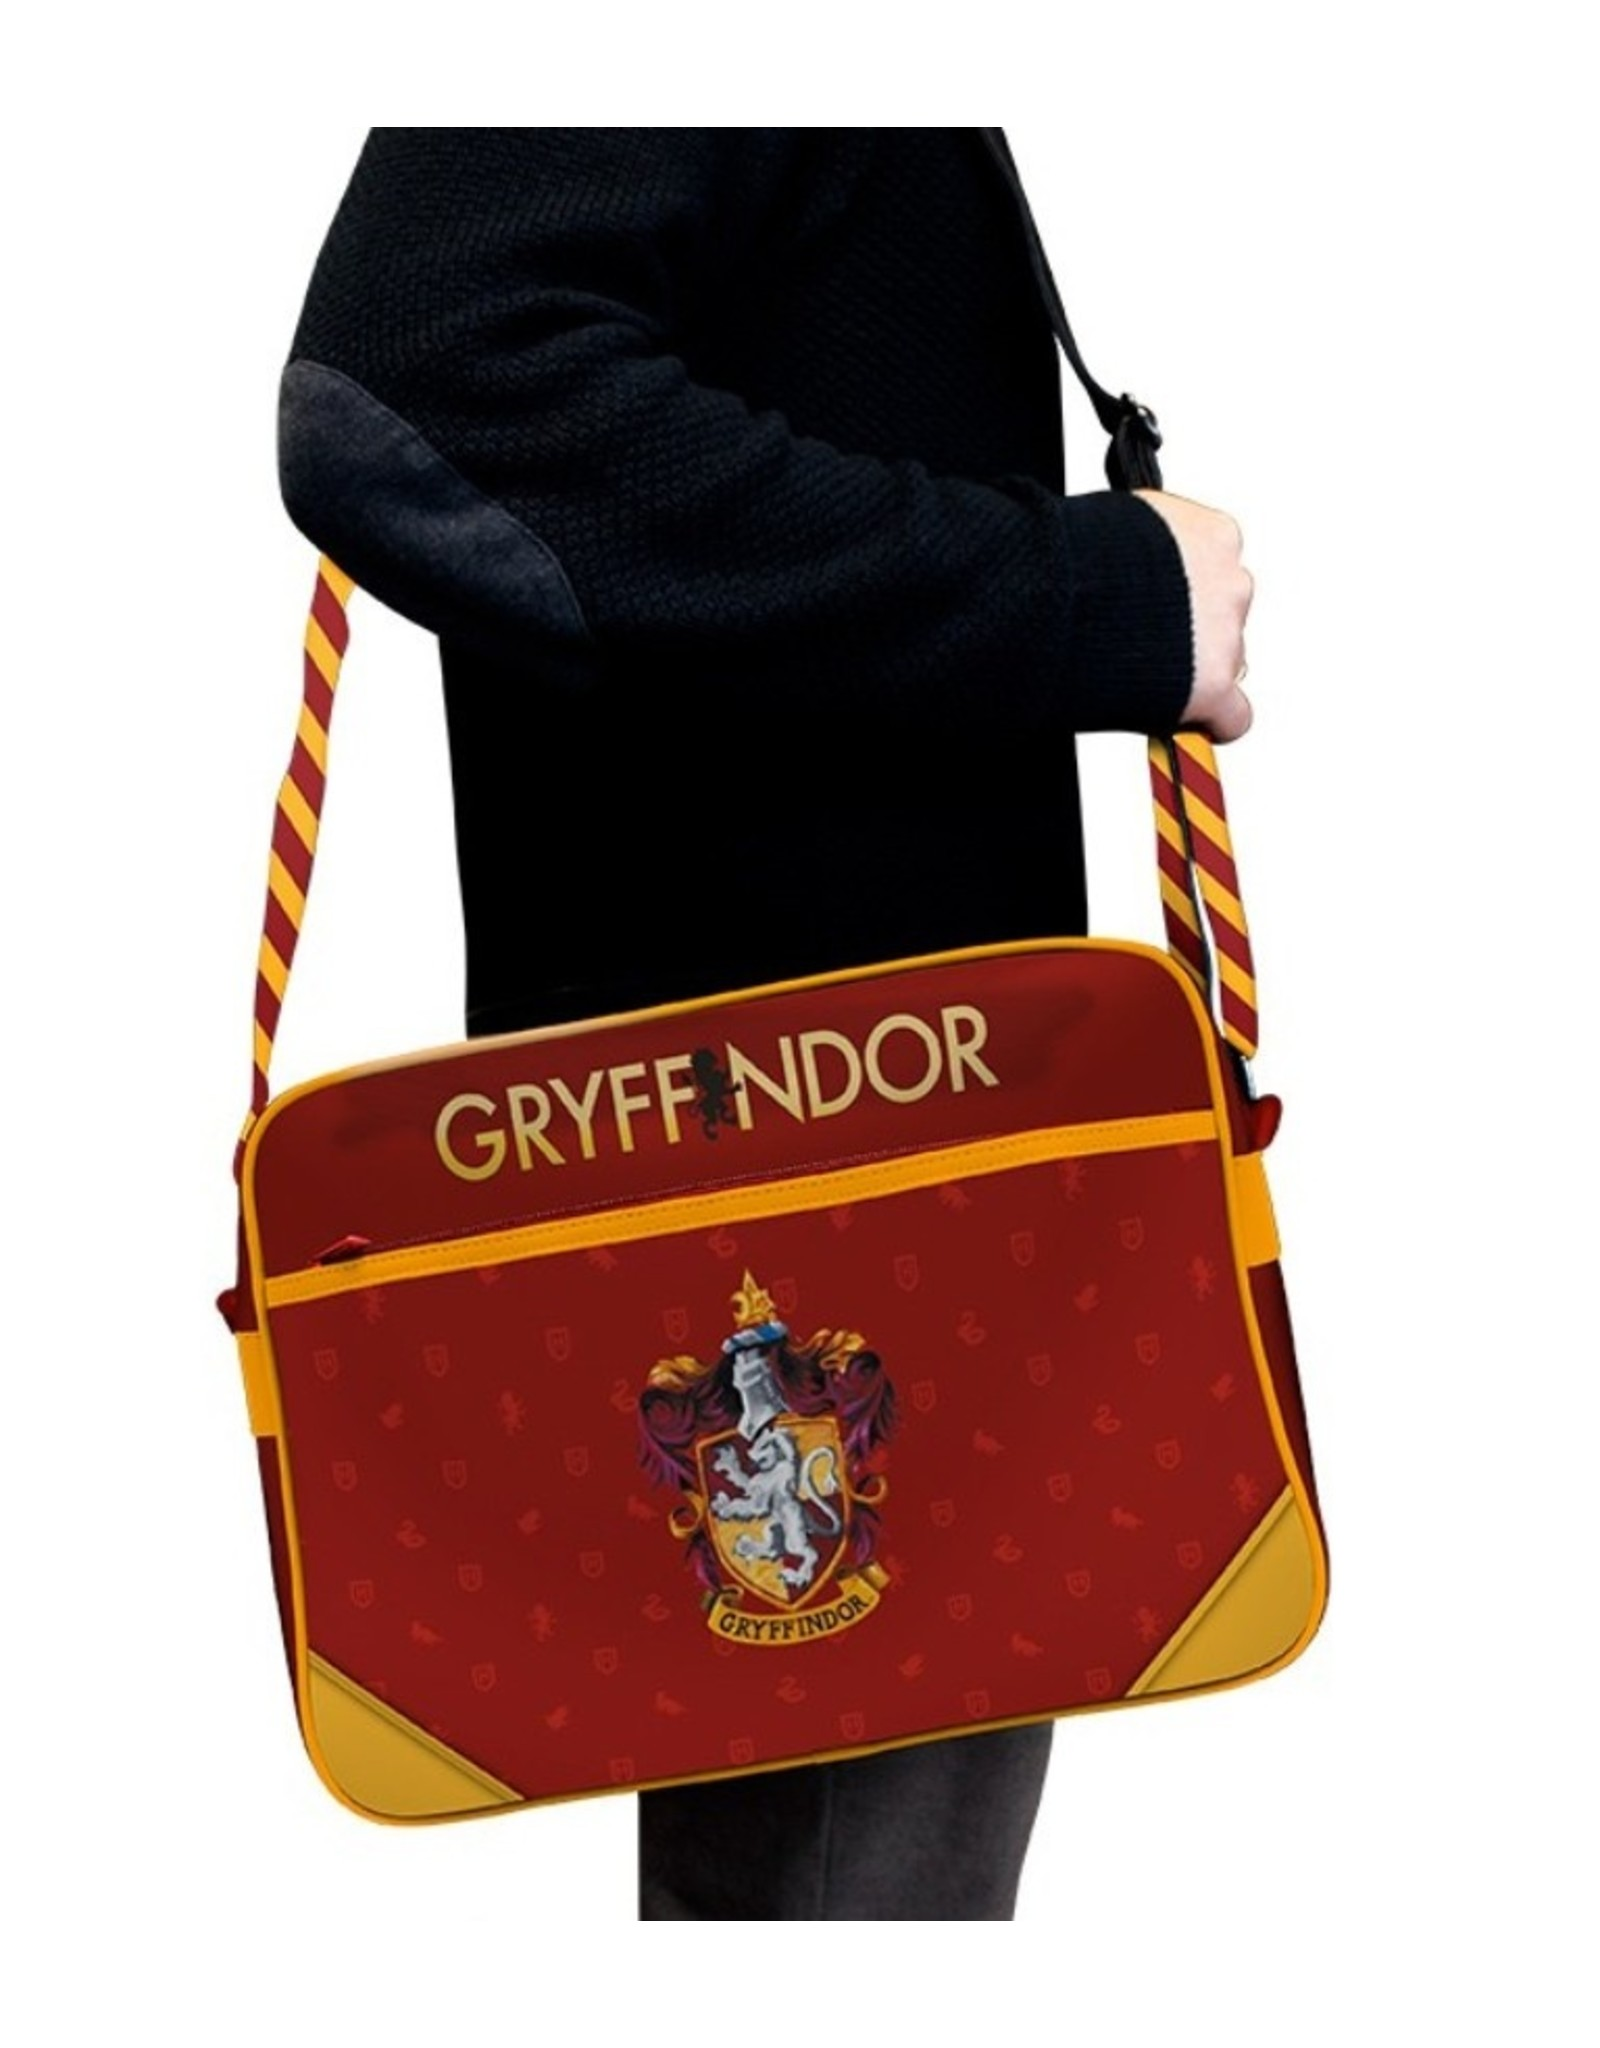 Harry Potter Harry Potter bags - Harry Potter Gryffindor Messenger bag